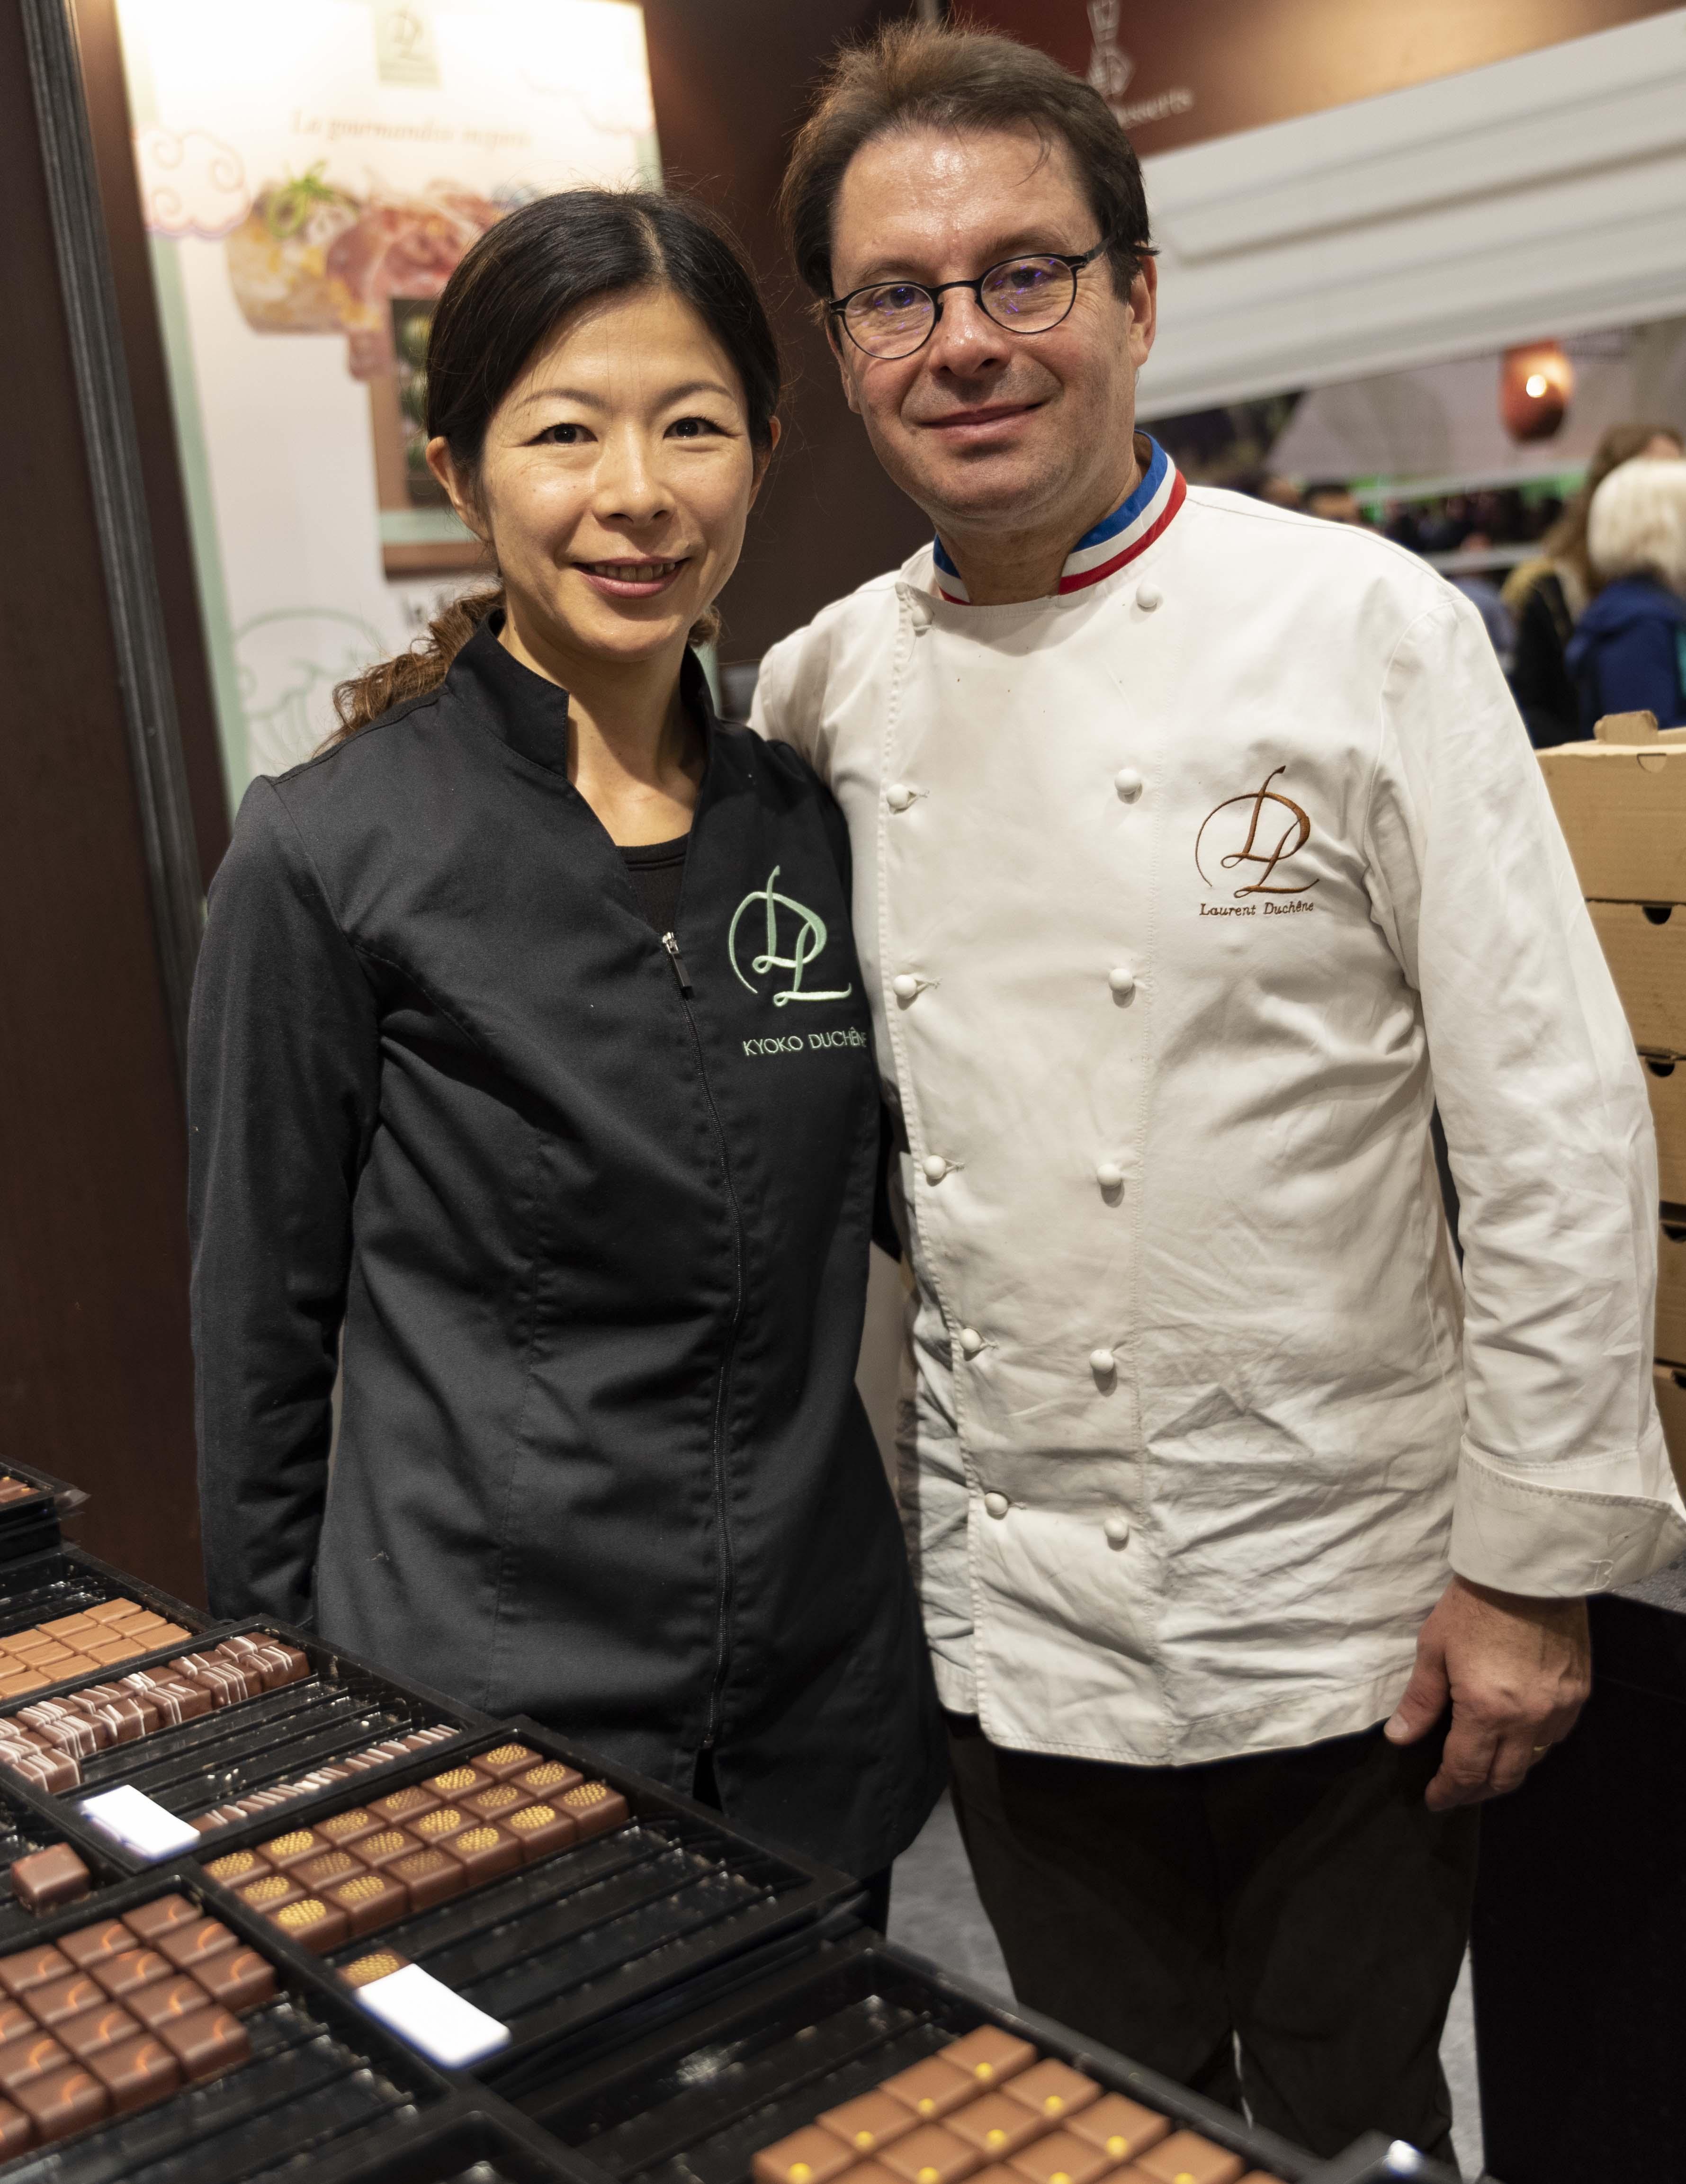 Laurent-Kyoko-Duchene-Salon-Chocolat-Paris